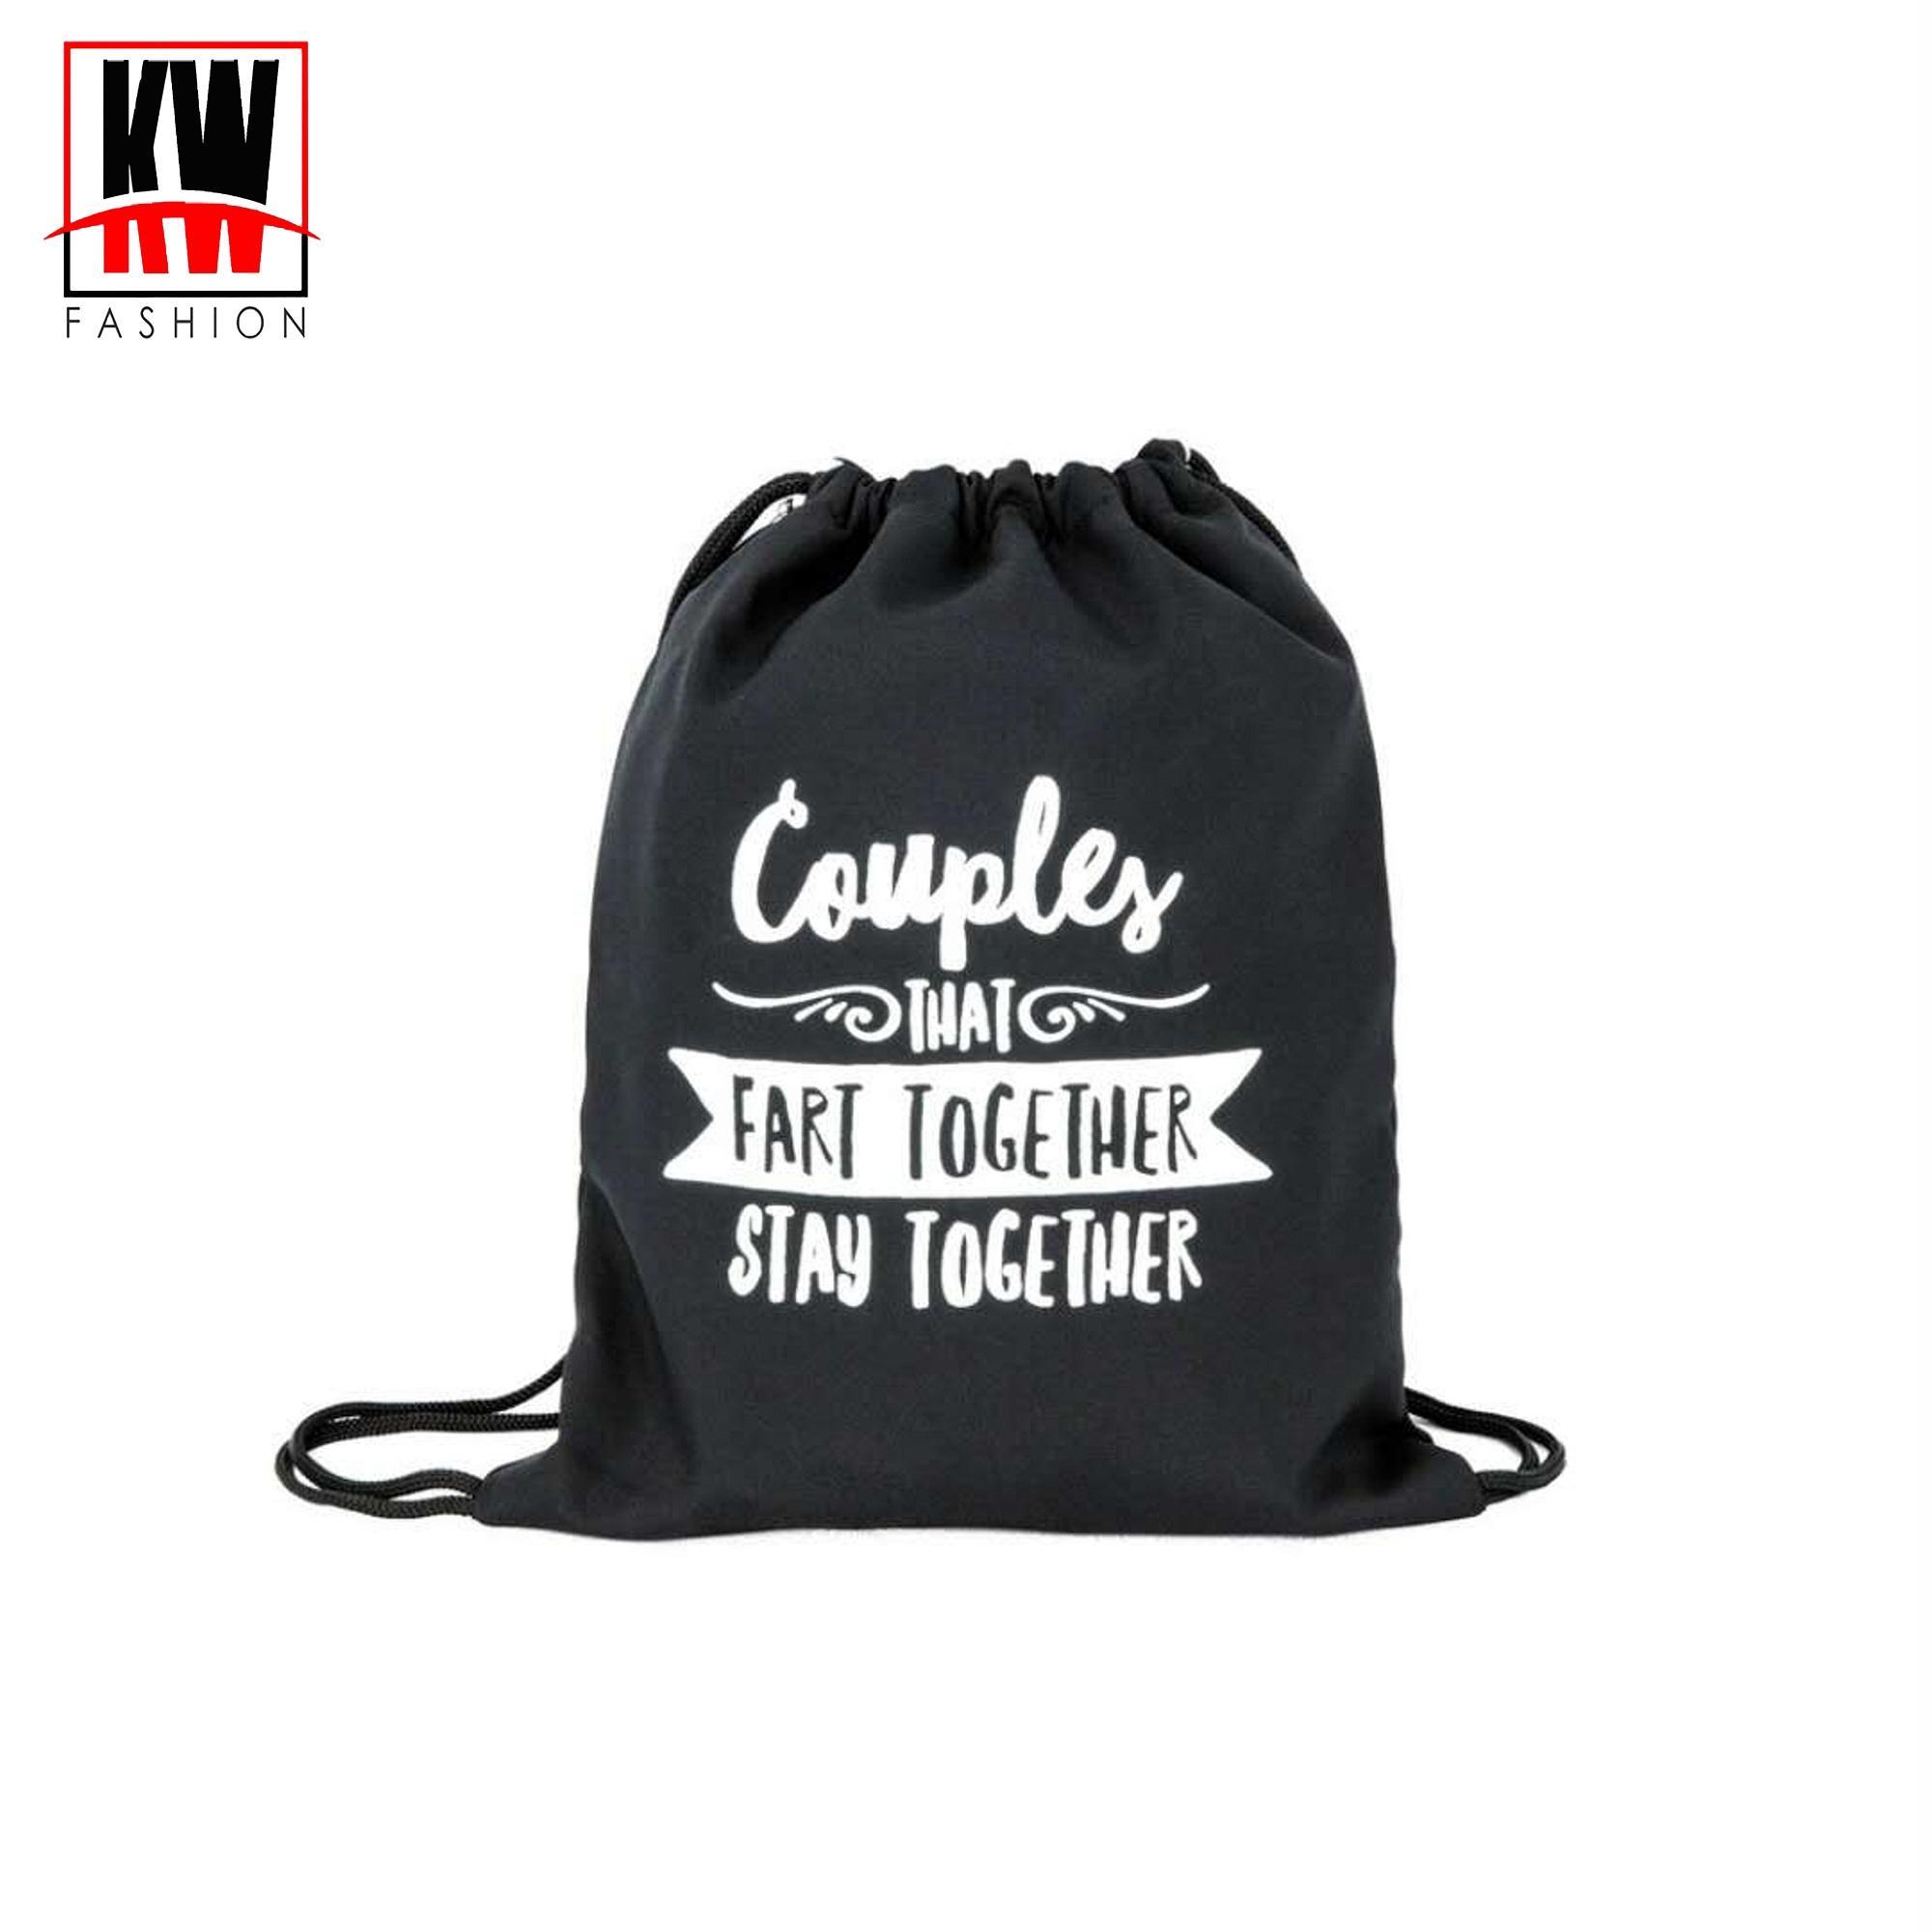 7e50cffb4ab7 KW String Bag